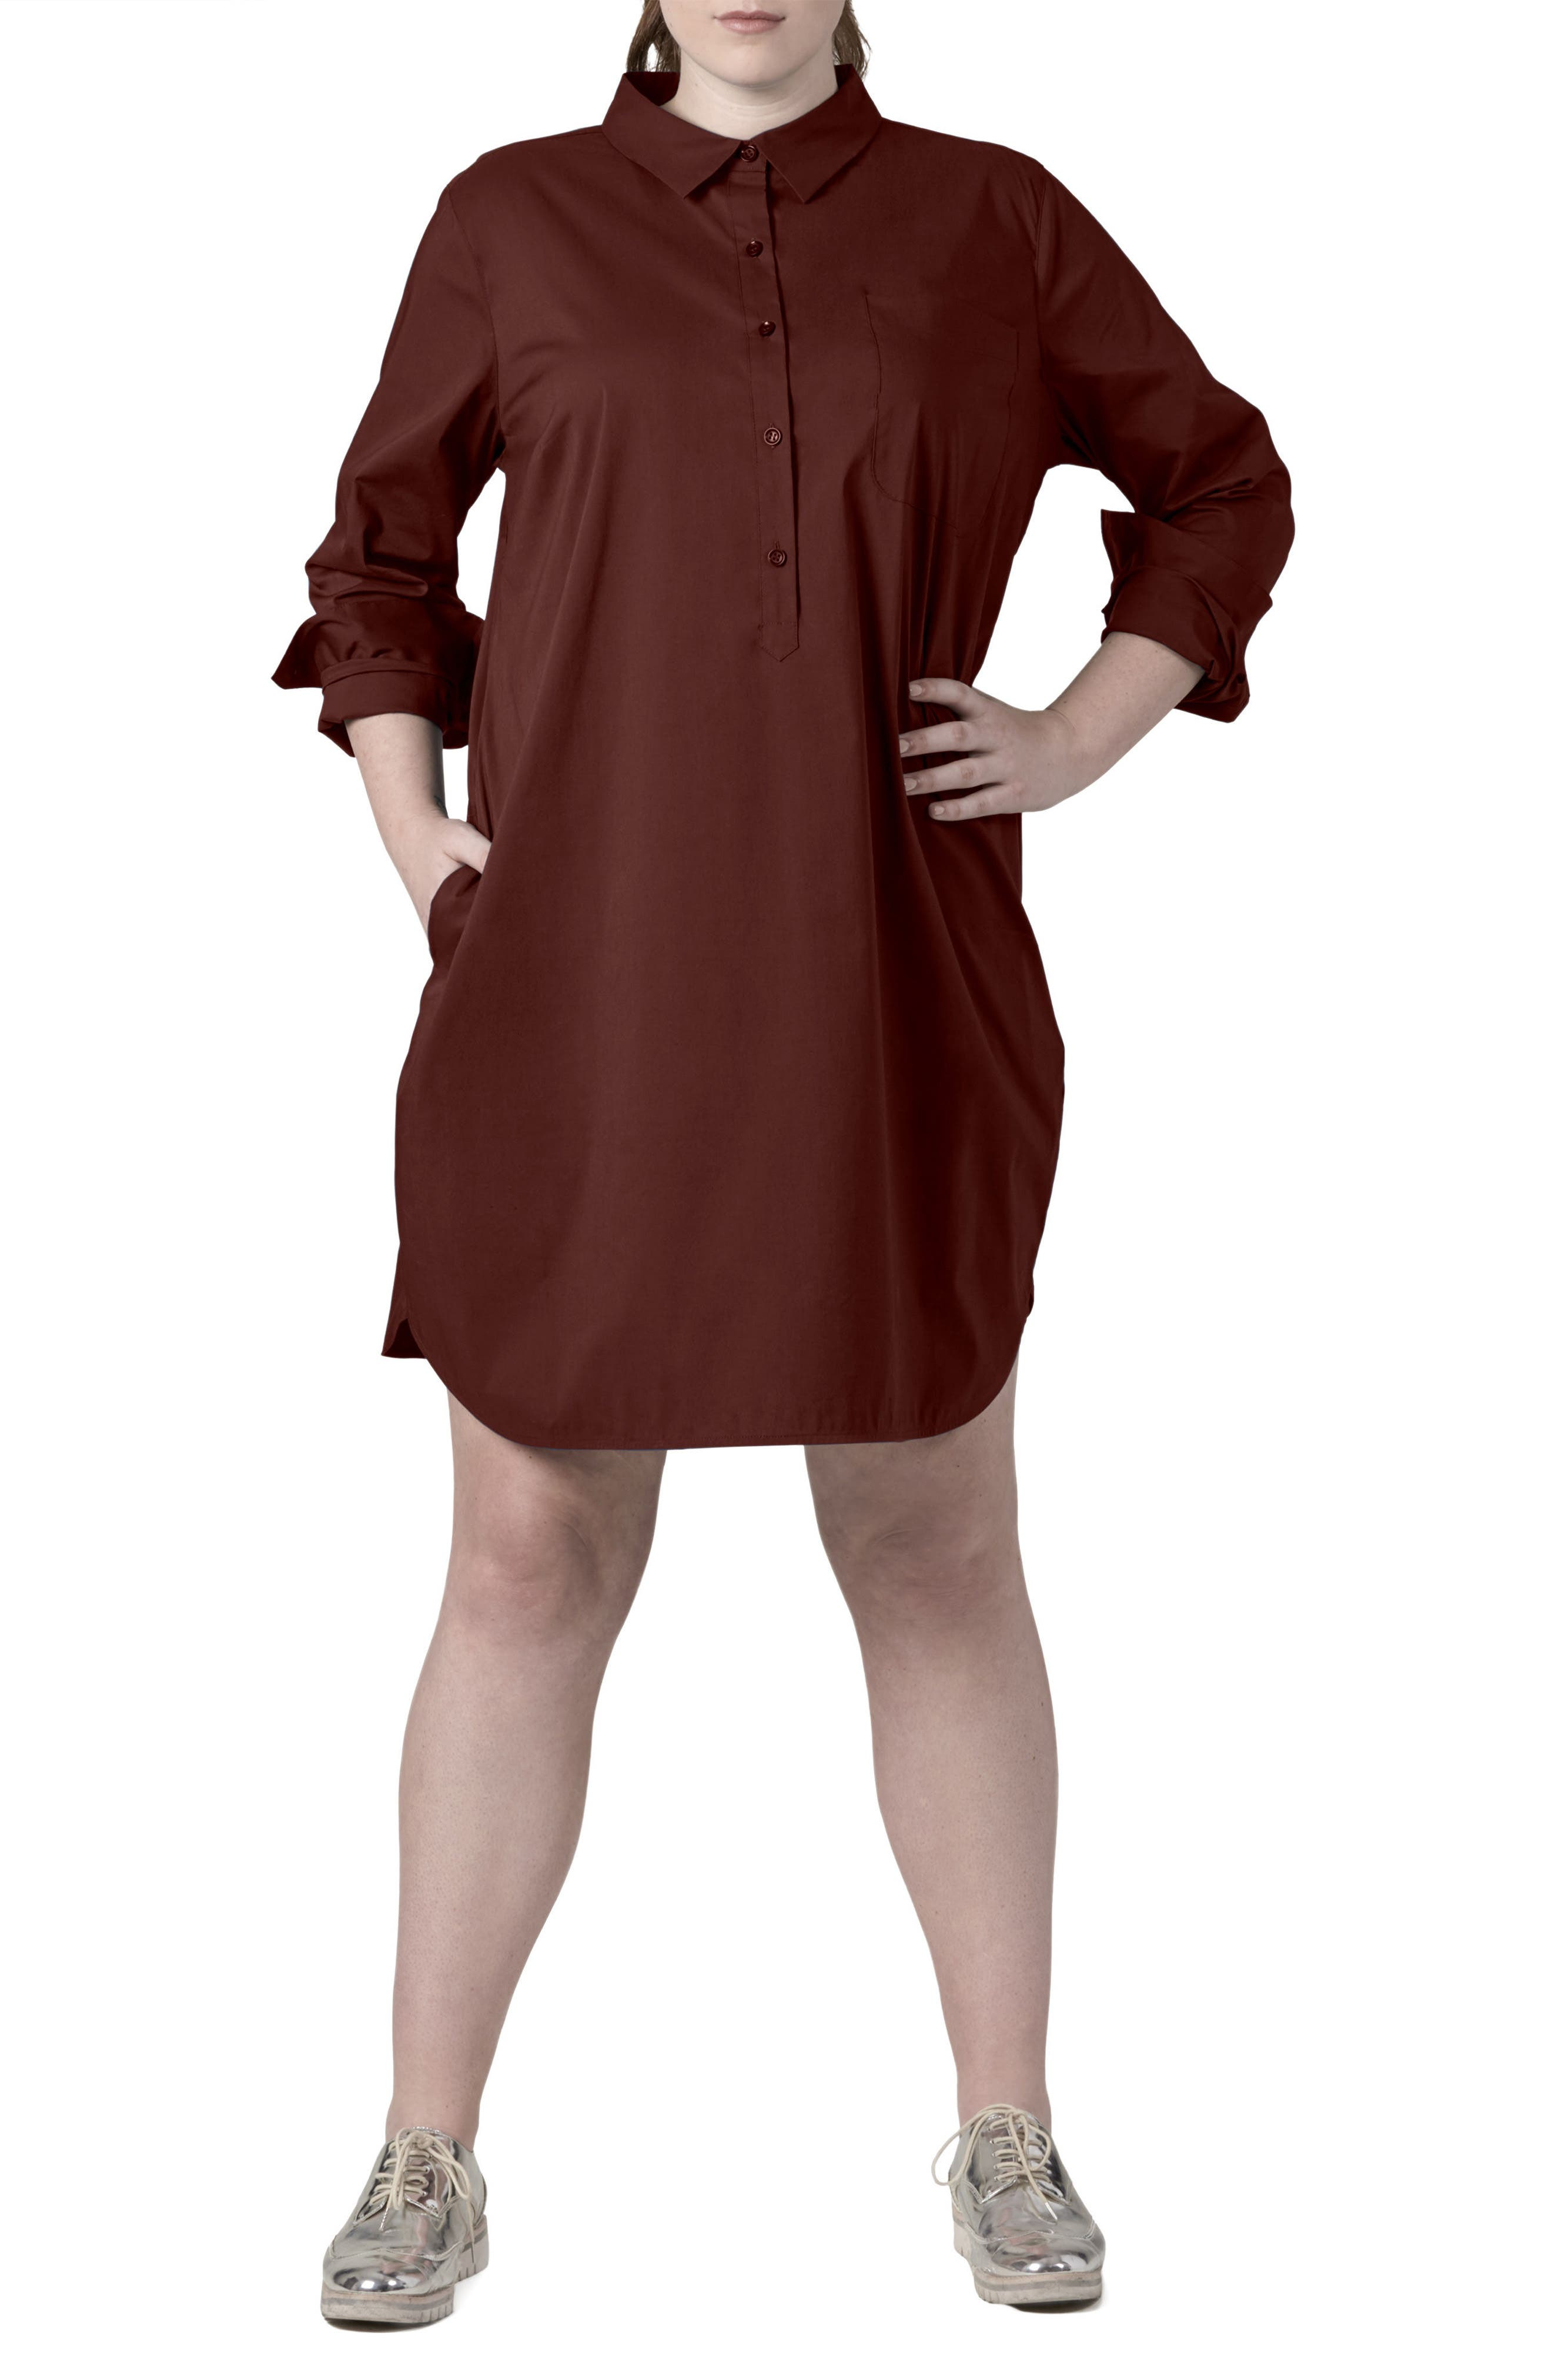 Rubicon Shirtdress,                             Main thumbnail 1, color,                             RUM RAISIN